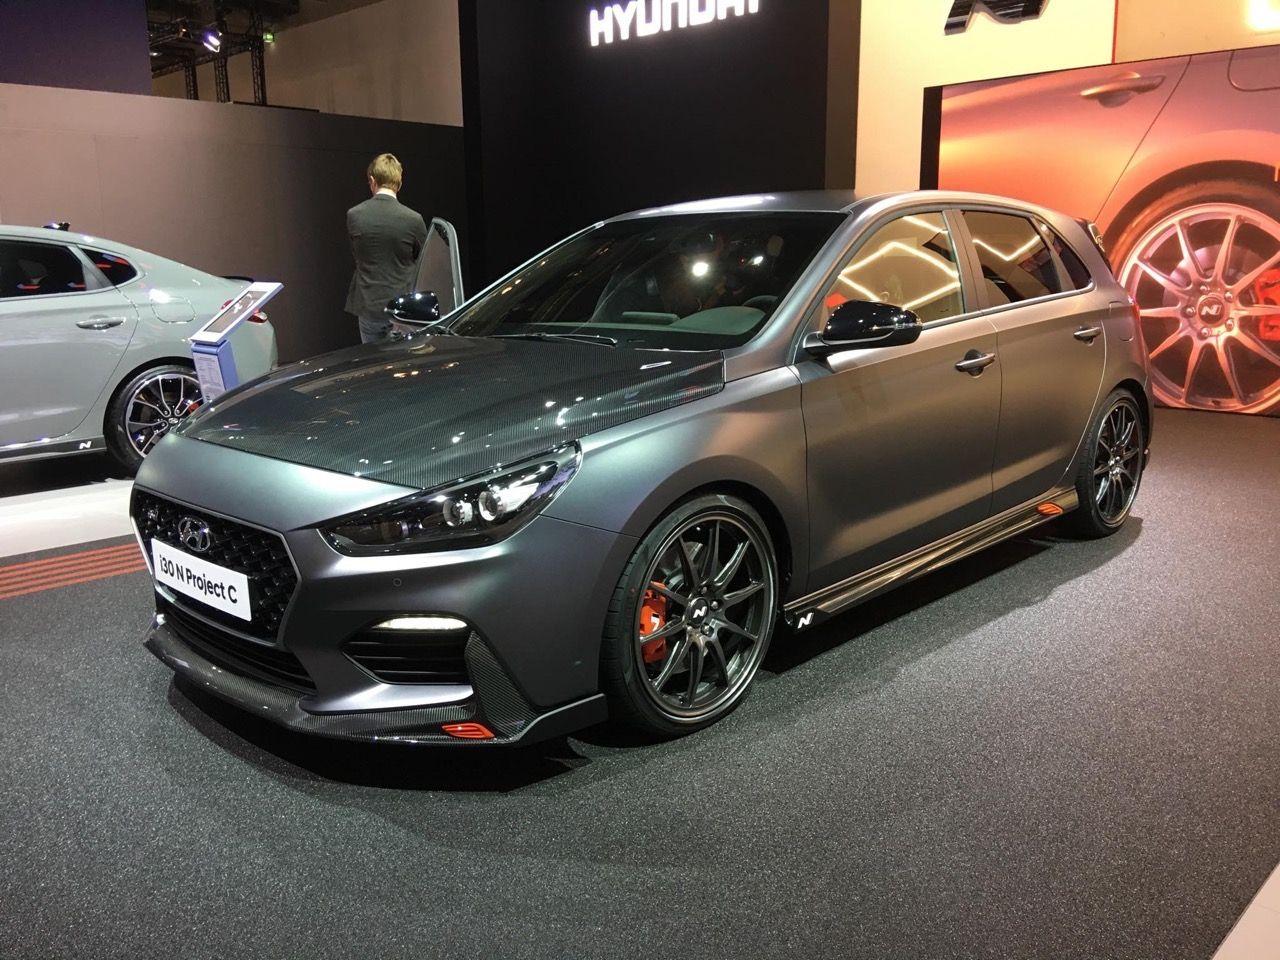 2019 Hyundai I30 N Project C 2019 Hyundai I30 N Project C